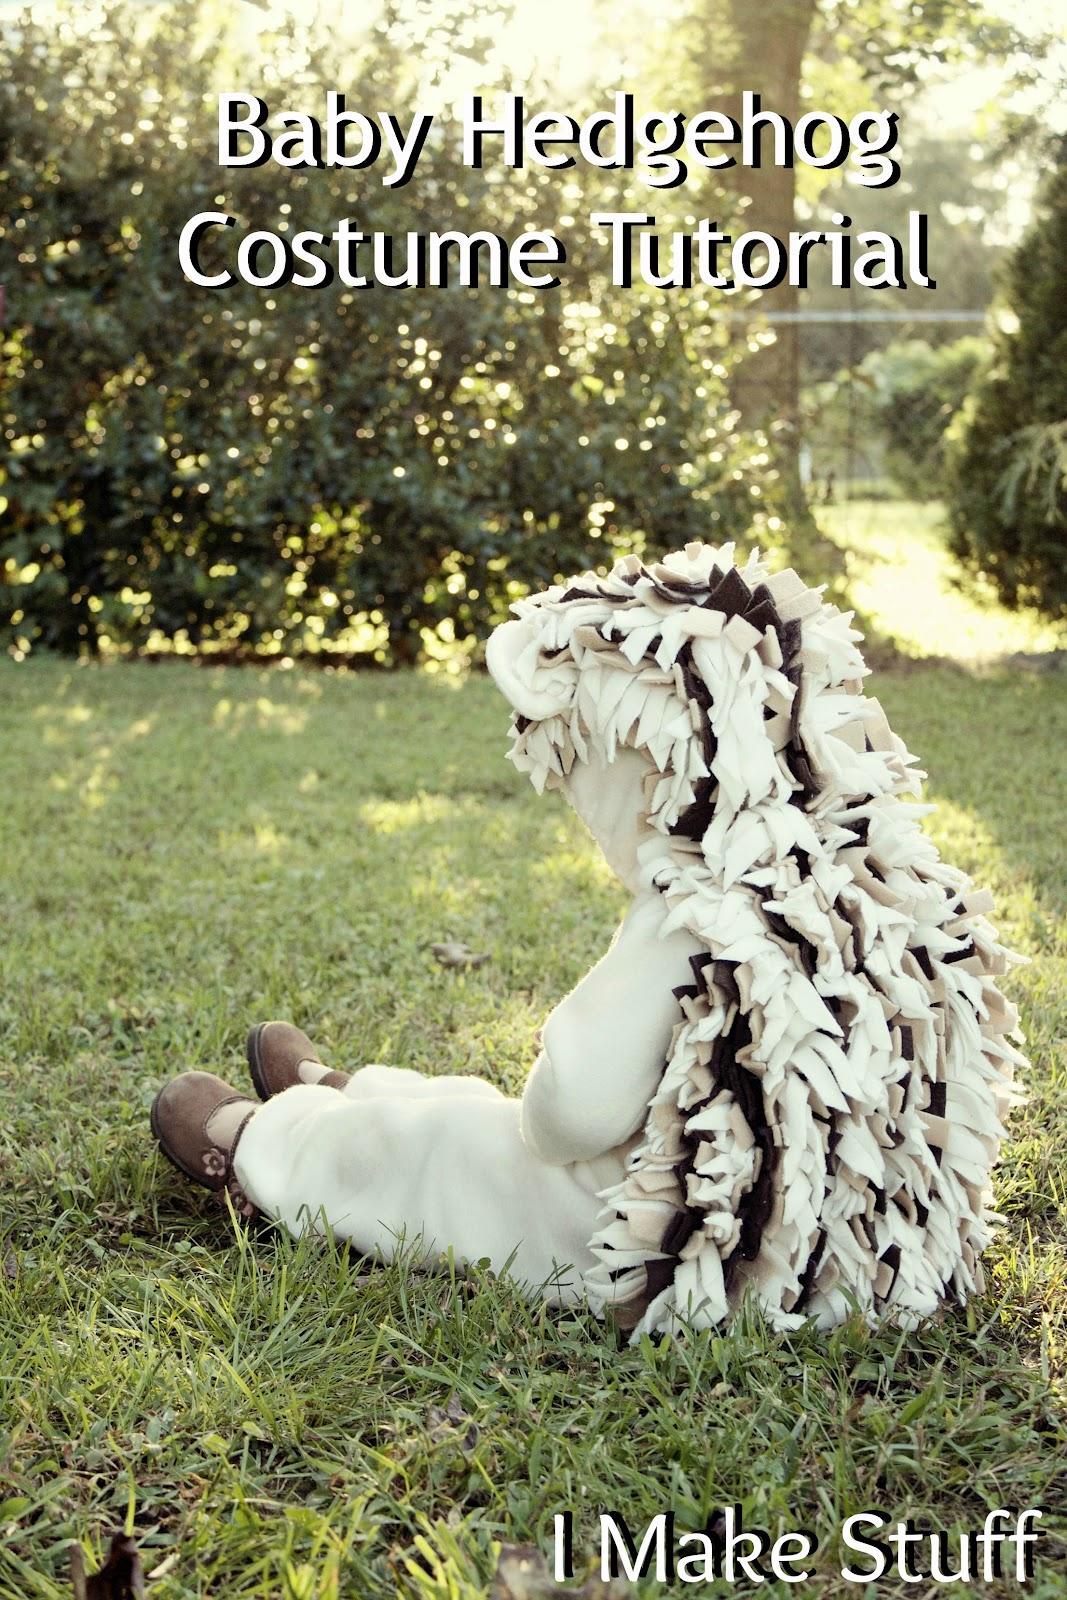 Hedgehog Costume Tutorial